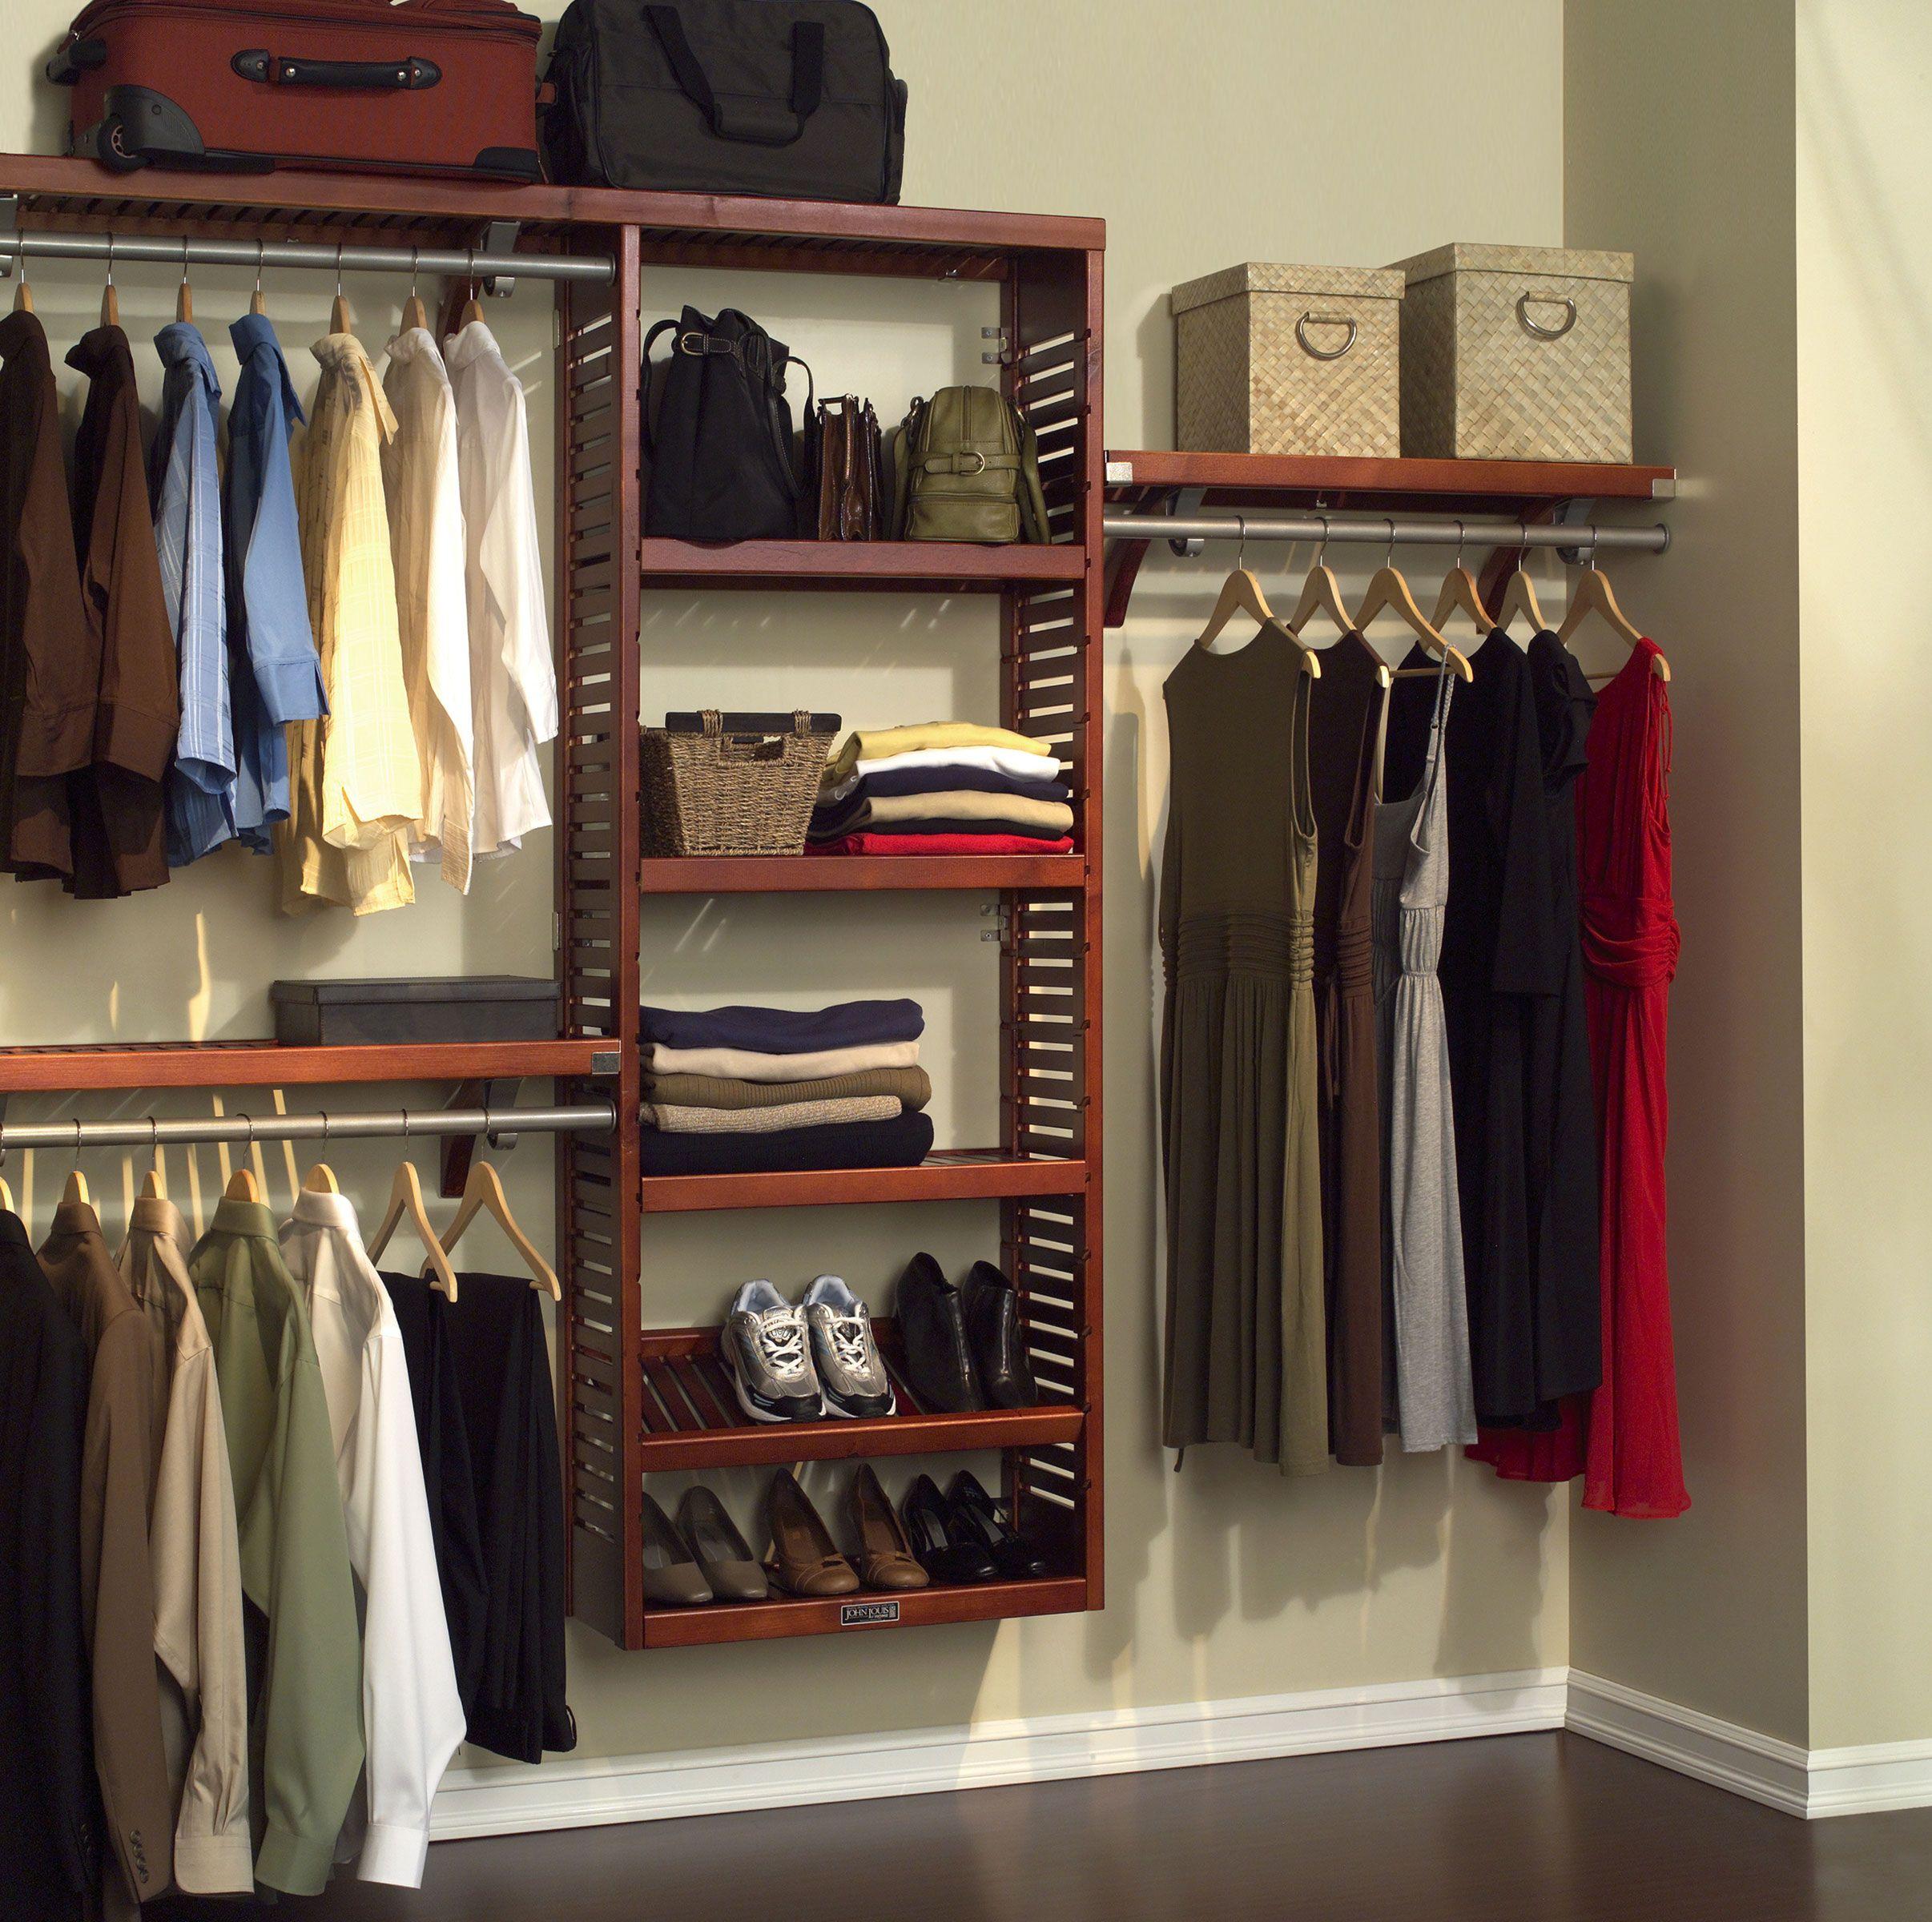 Modified Closets | Closet Organizer 12u2033 Depth. Expands Coverage For Walk In  Closets